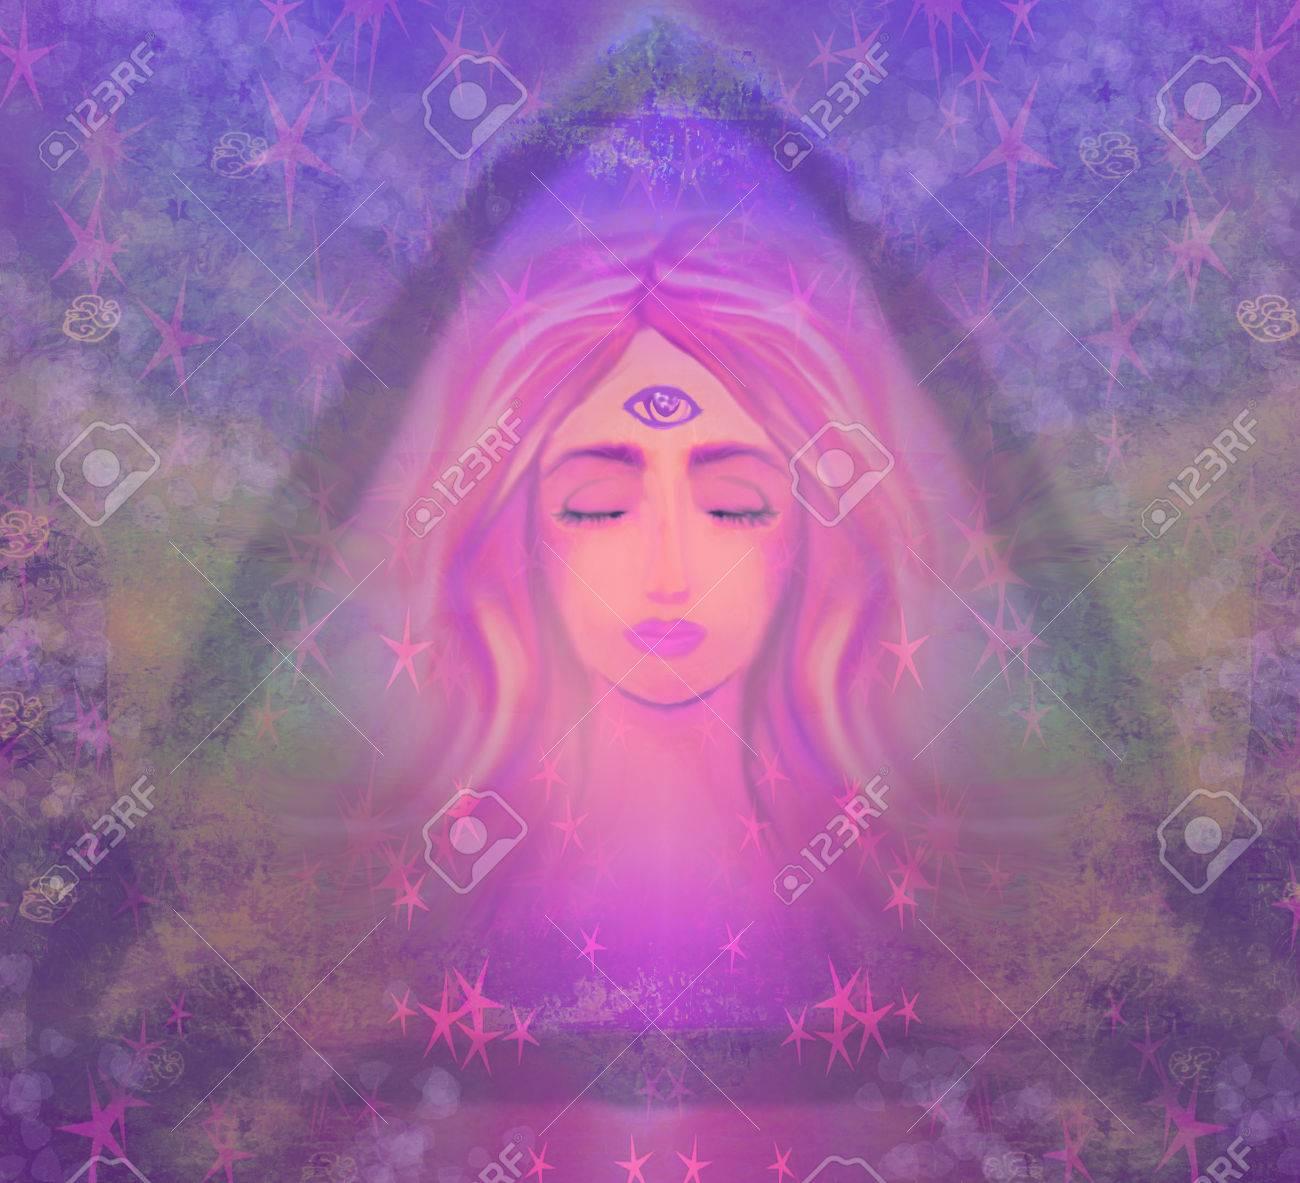 Woman with third eye, psychic supernatural senses - 34600178